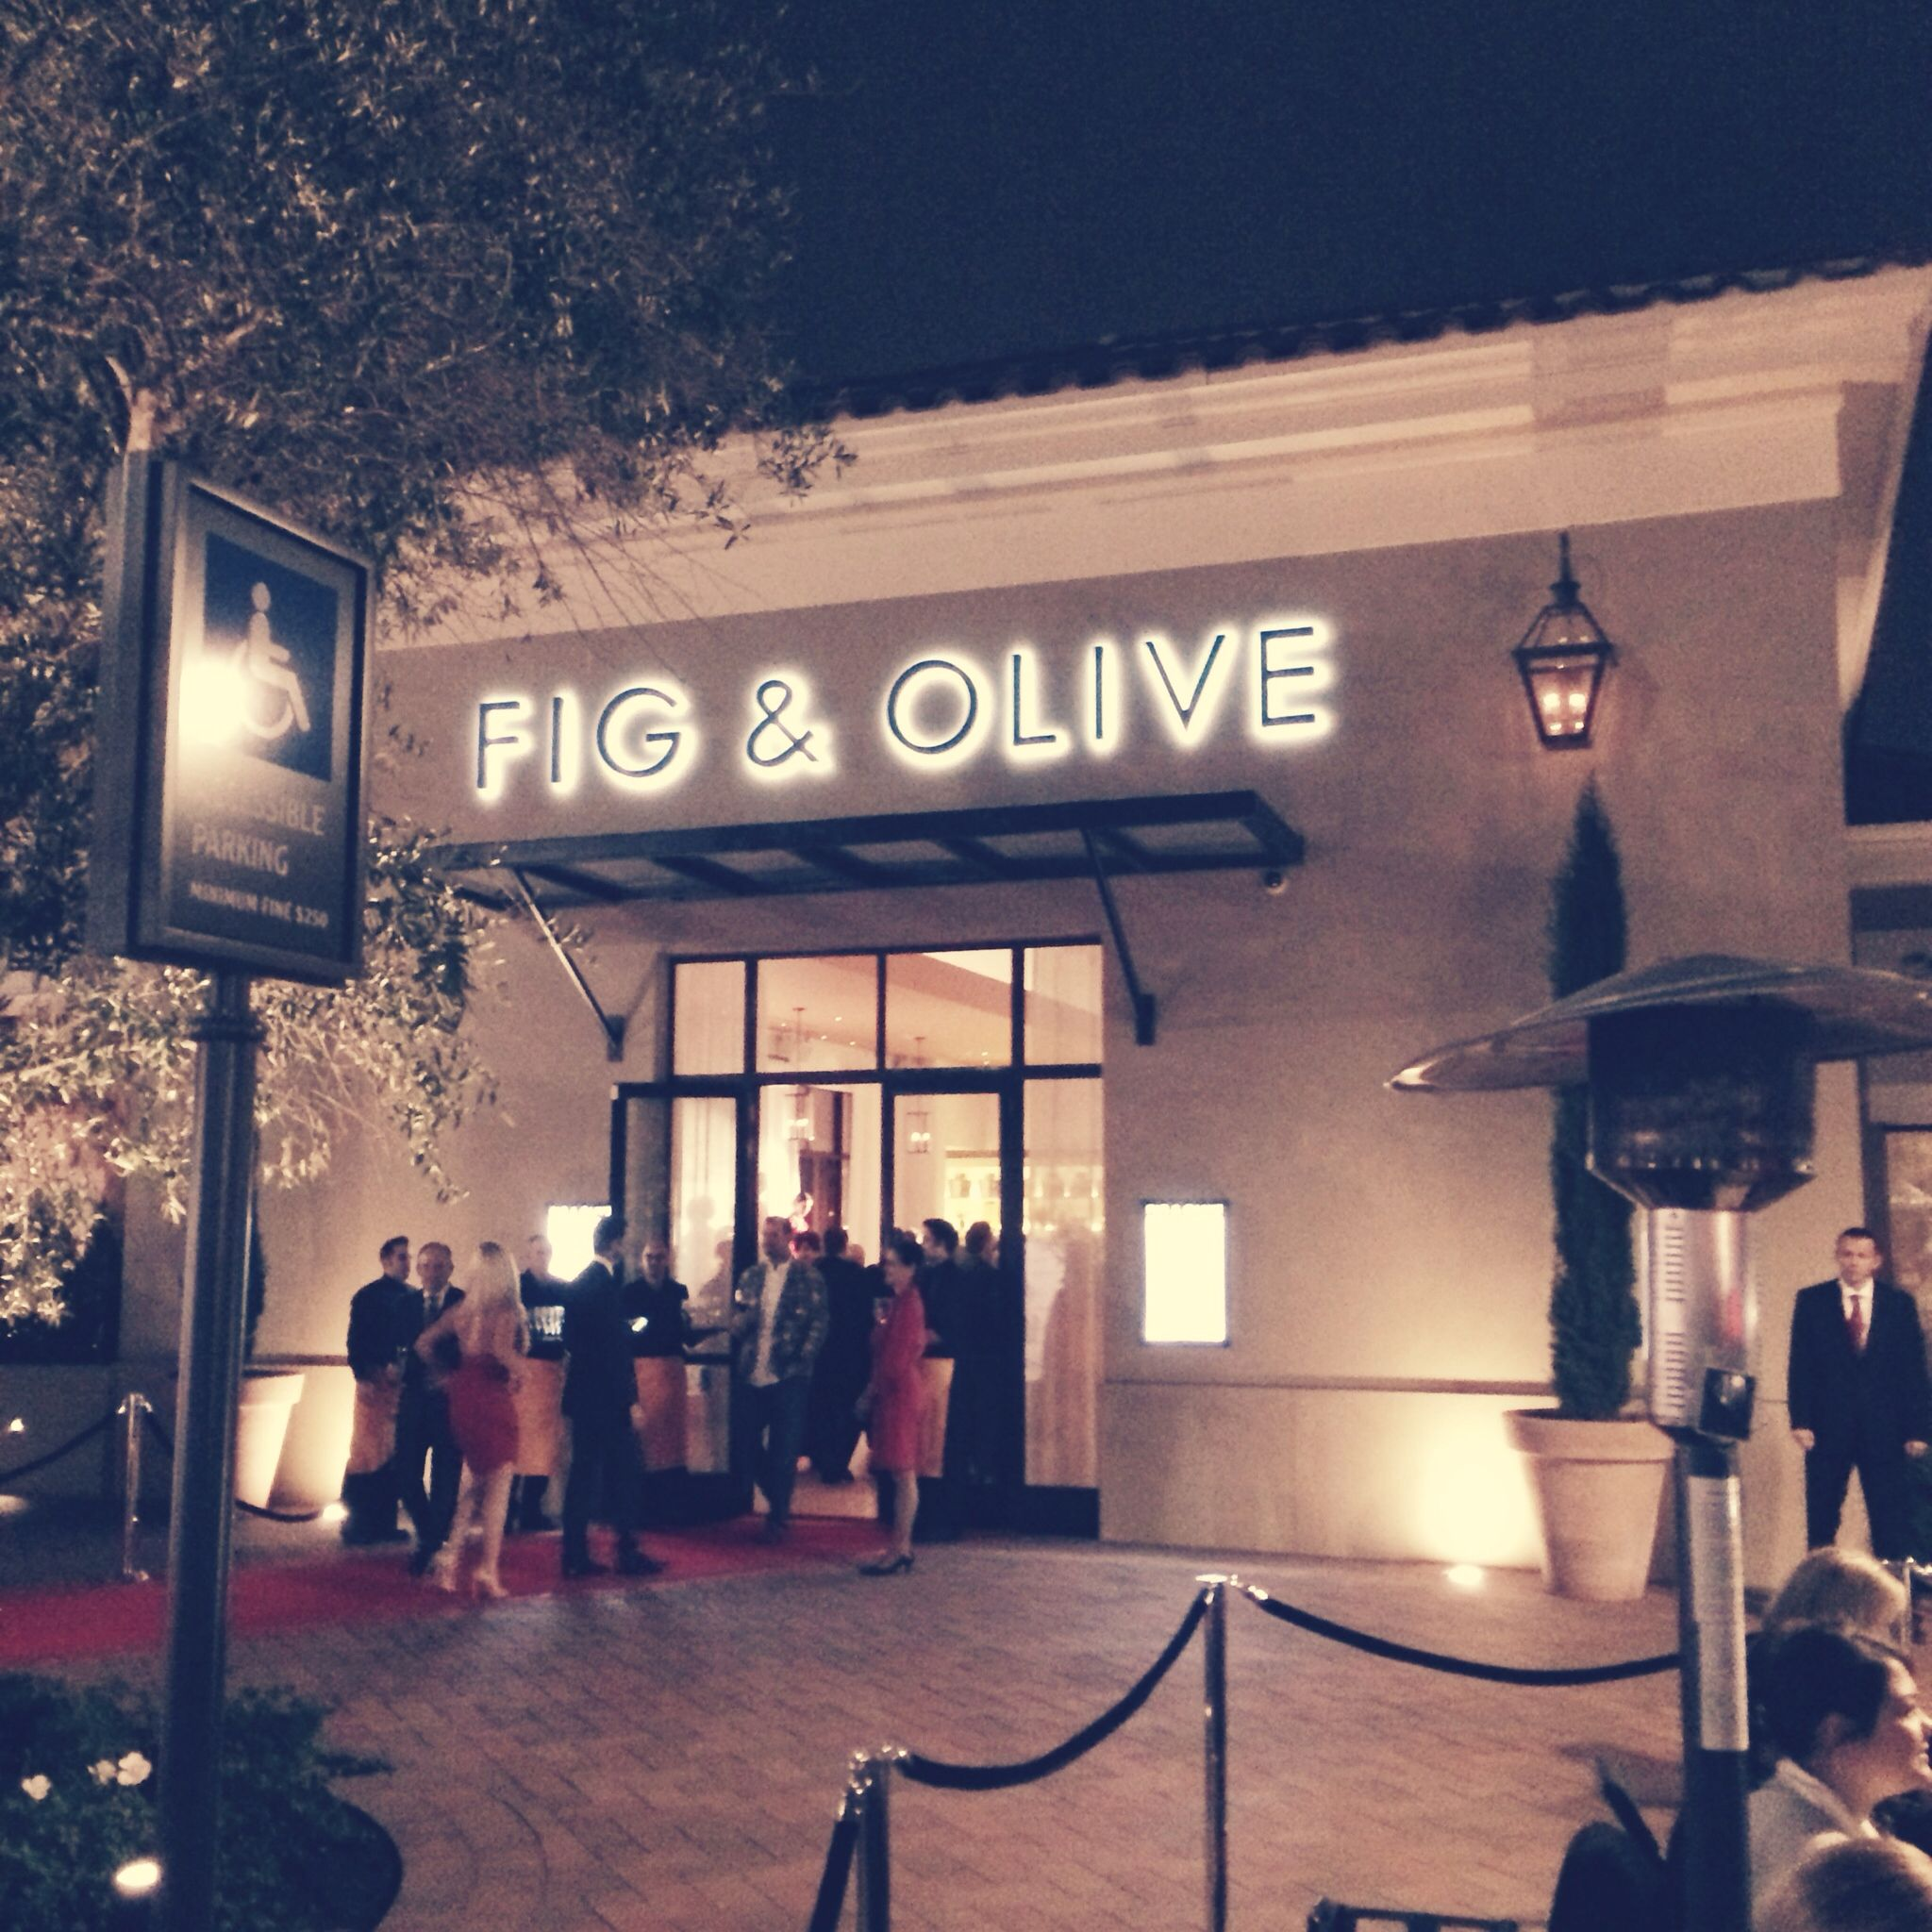 True Food Kitchen Newport Beach Ca: Fig And Olive, Newport Beach